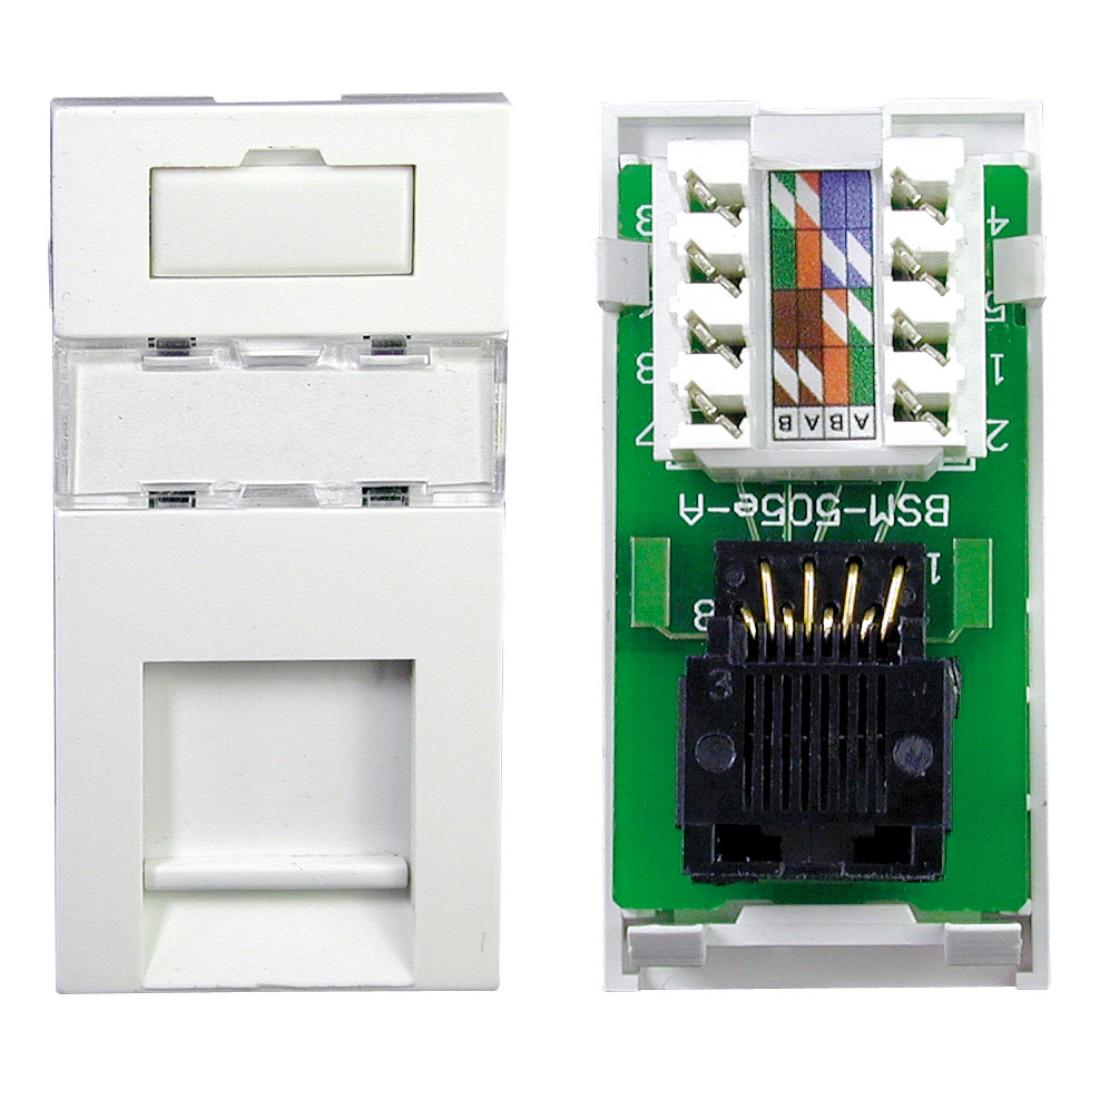 single cat5e idc rj45 outlet module 25 x 50mm white labgear. Black Bedroom Furniture Sets. Home Design Ideas